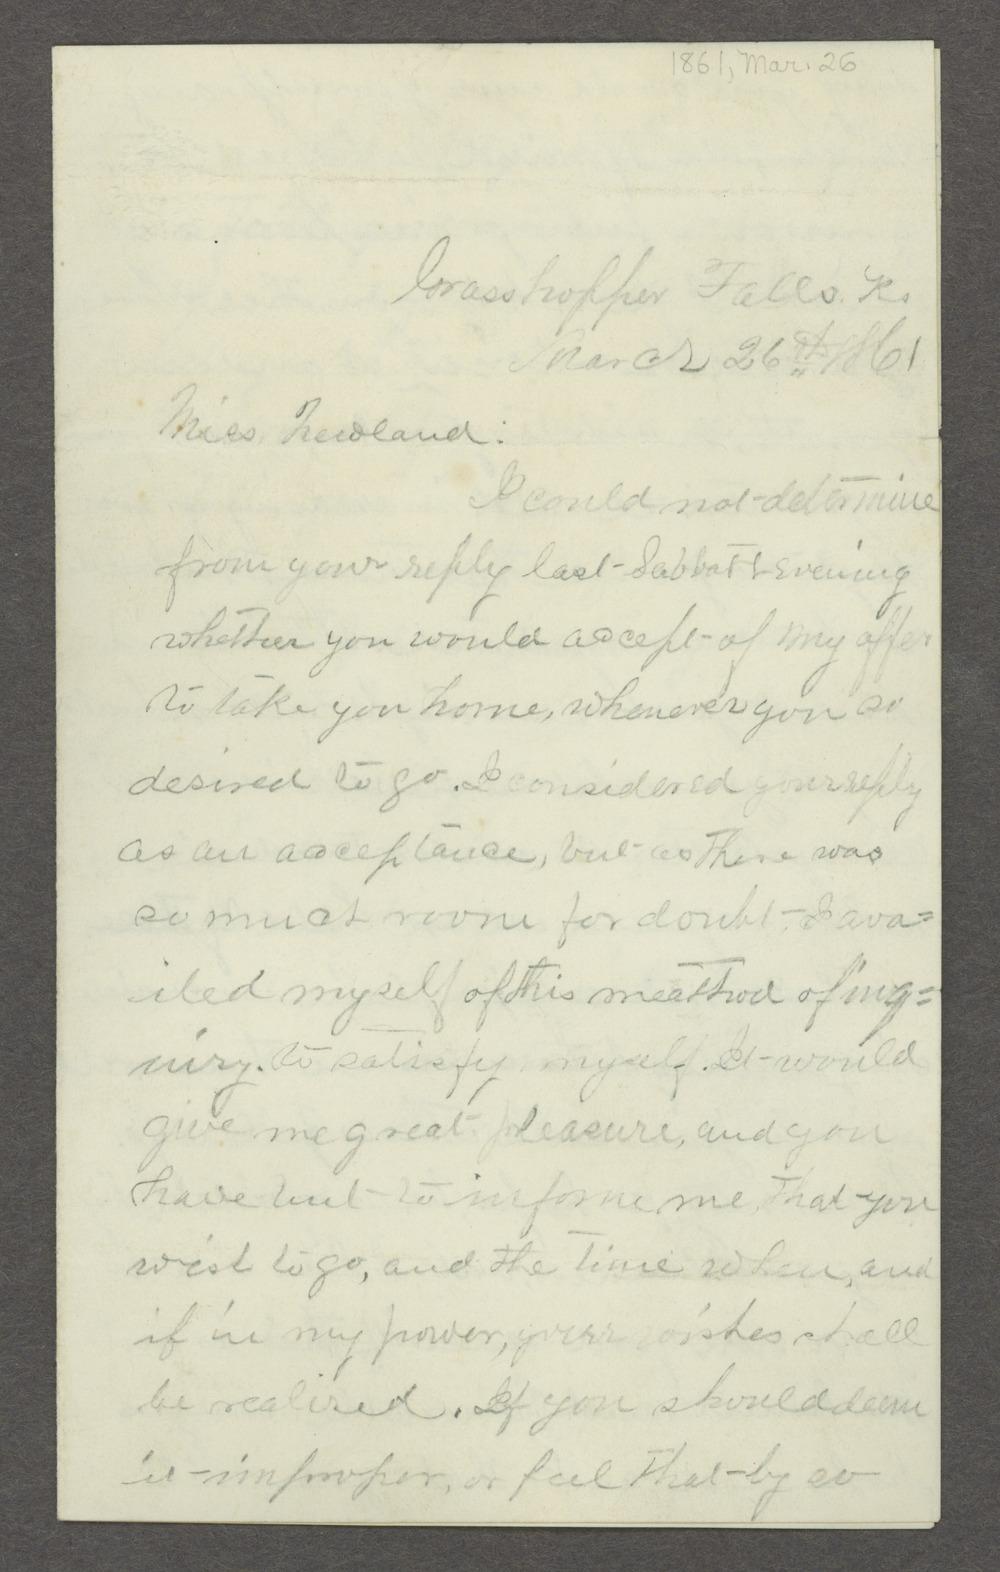 Lewis Stafford to Kate Newland correspondence - 4